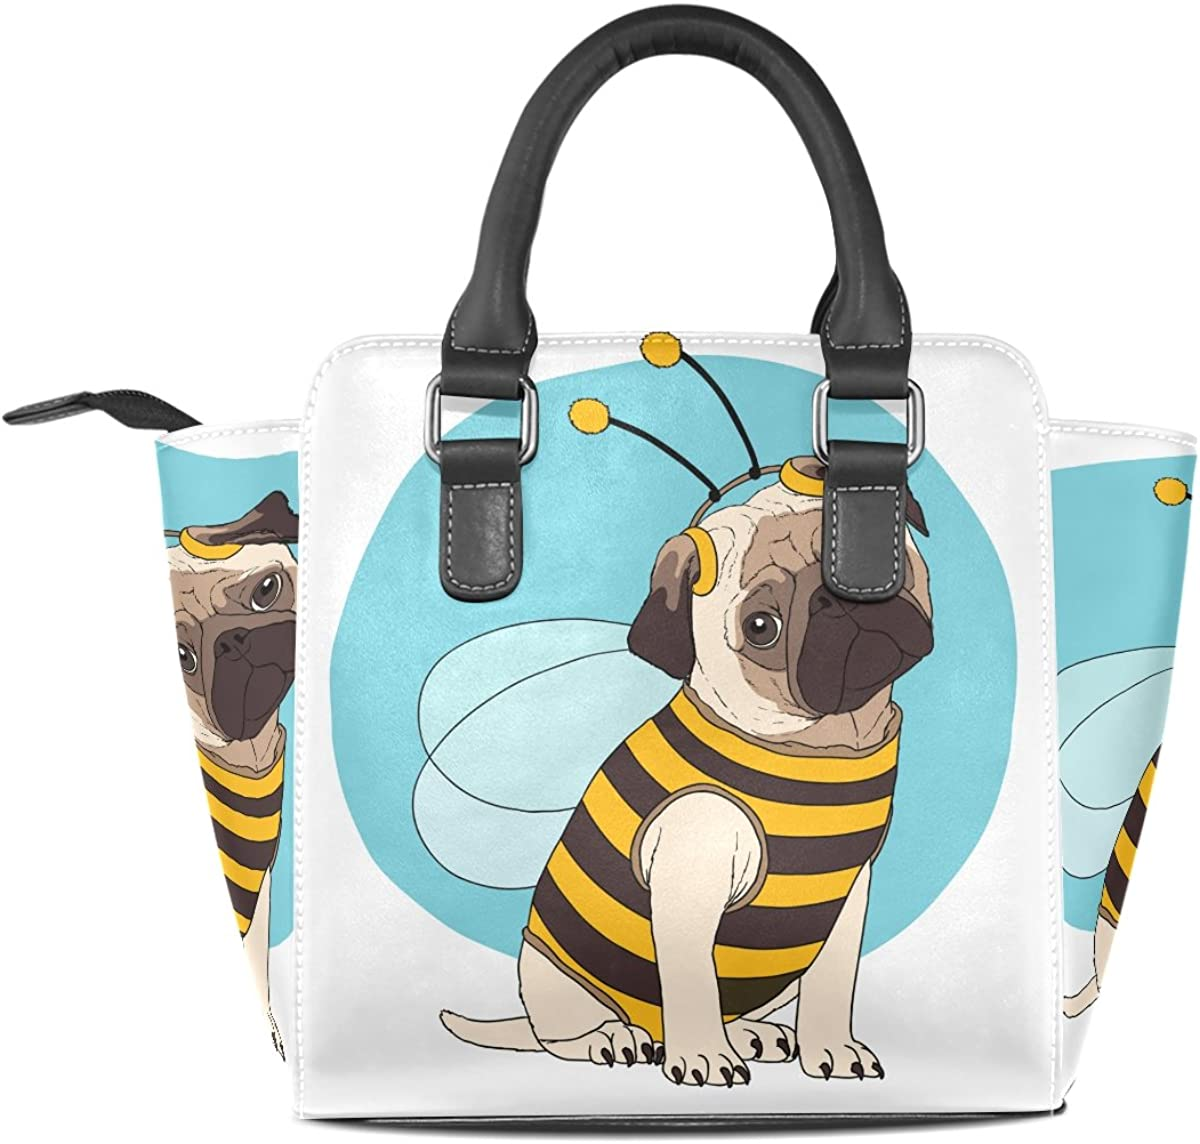 Cool Dog Cartoon Leather Handbags Purses Shoulder Tote Satchel Bags Womens